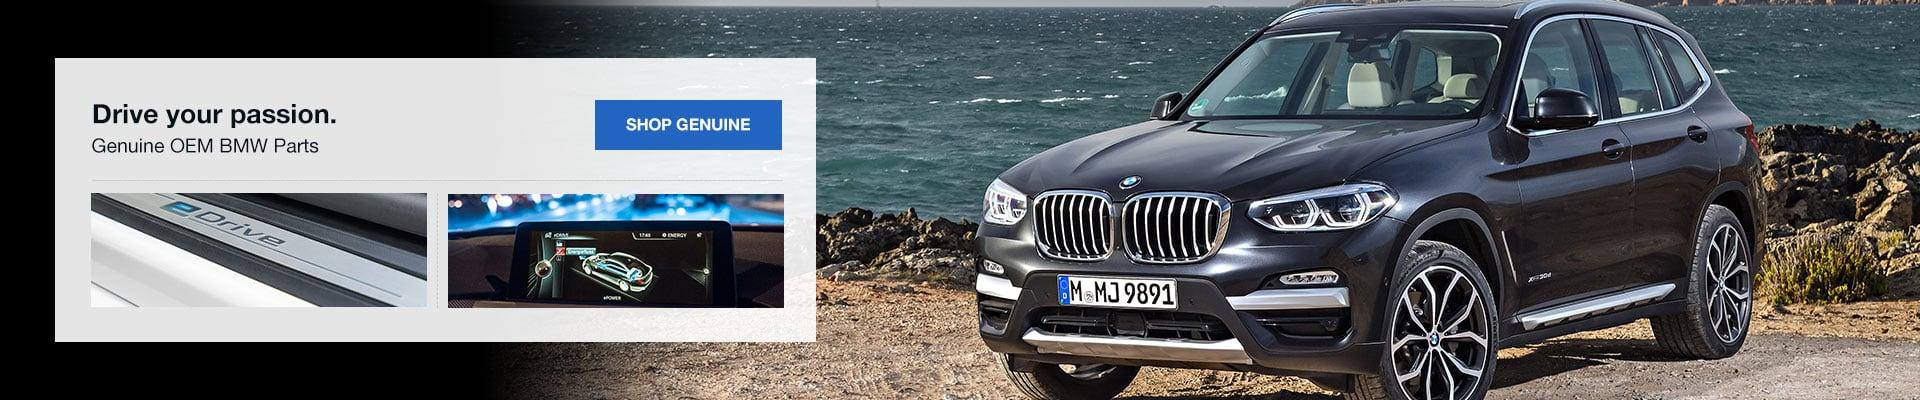 OEM BMW Parts